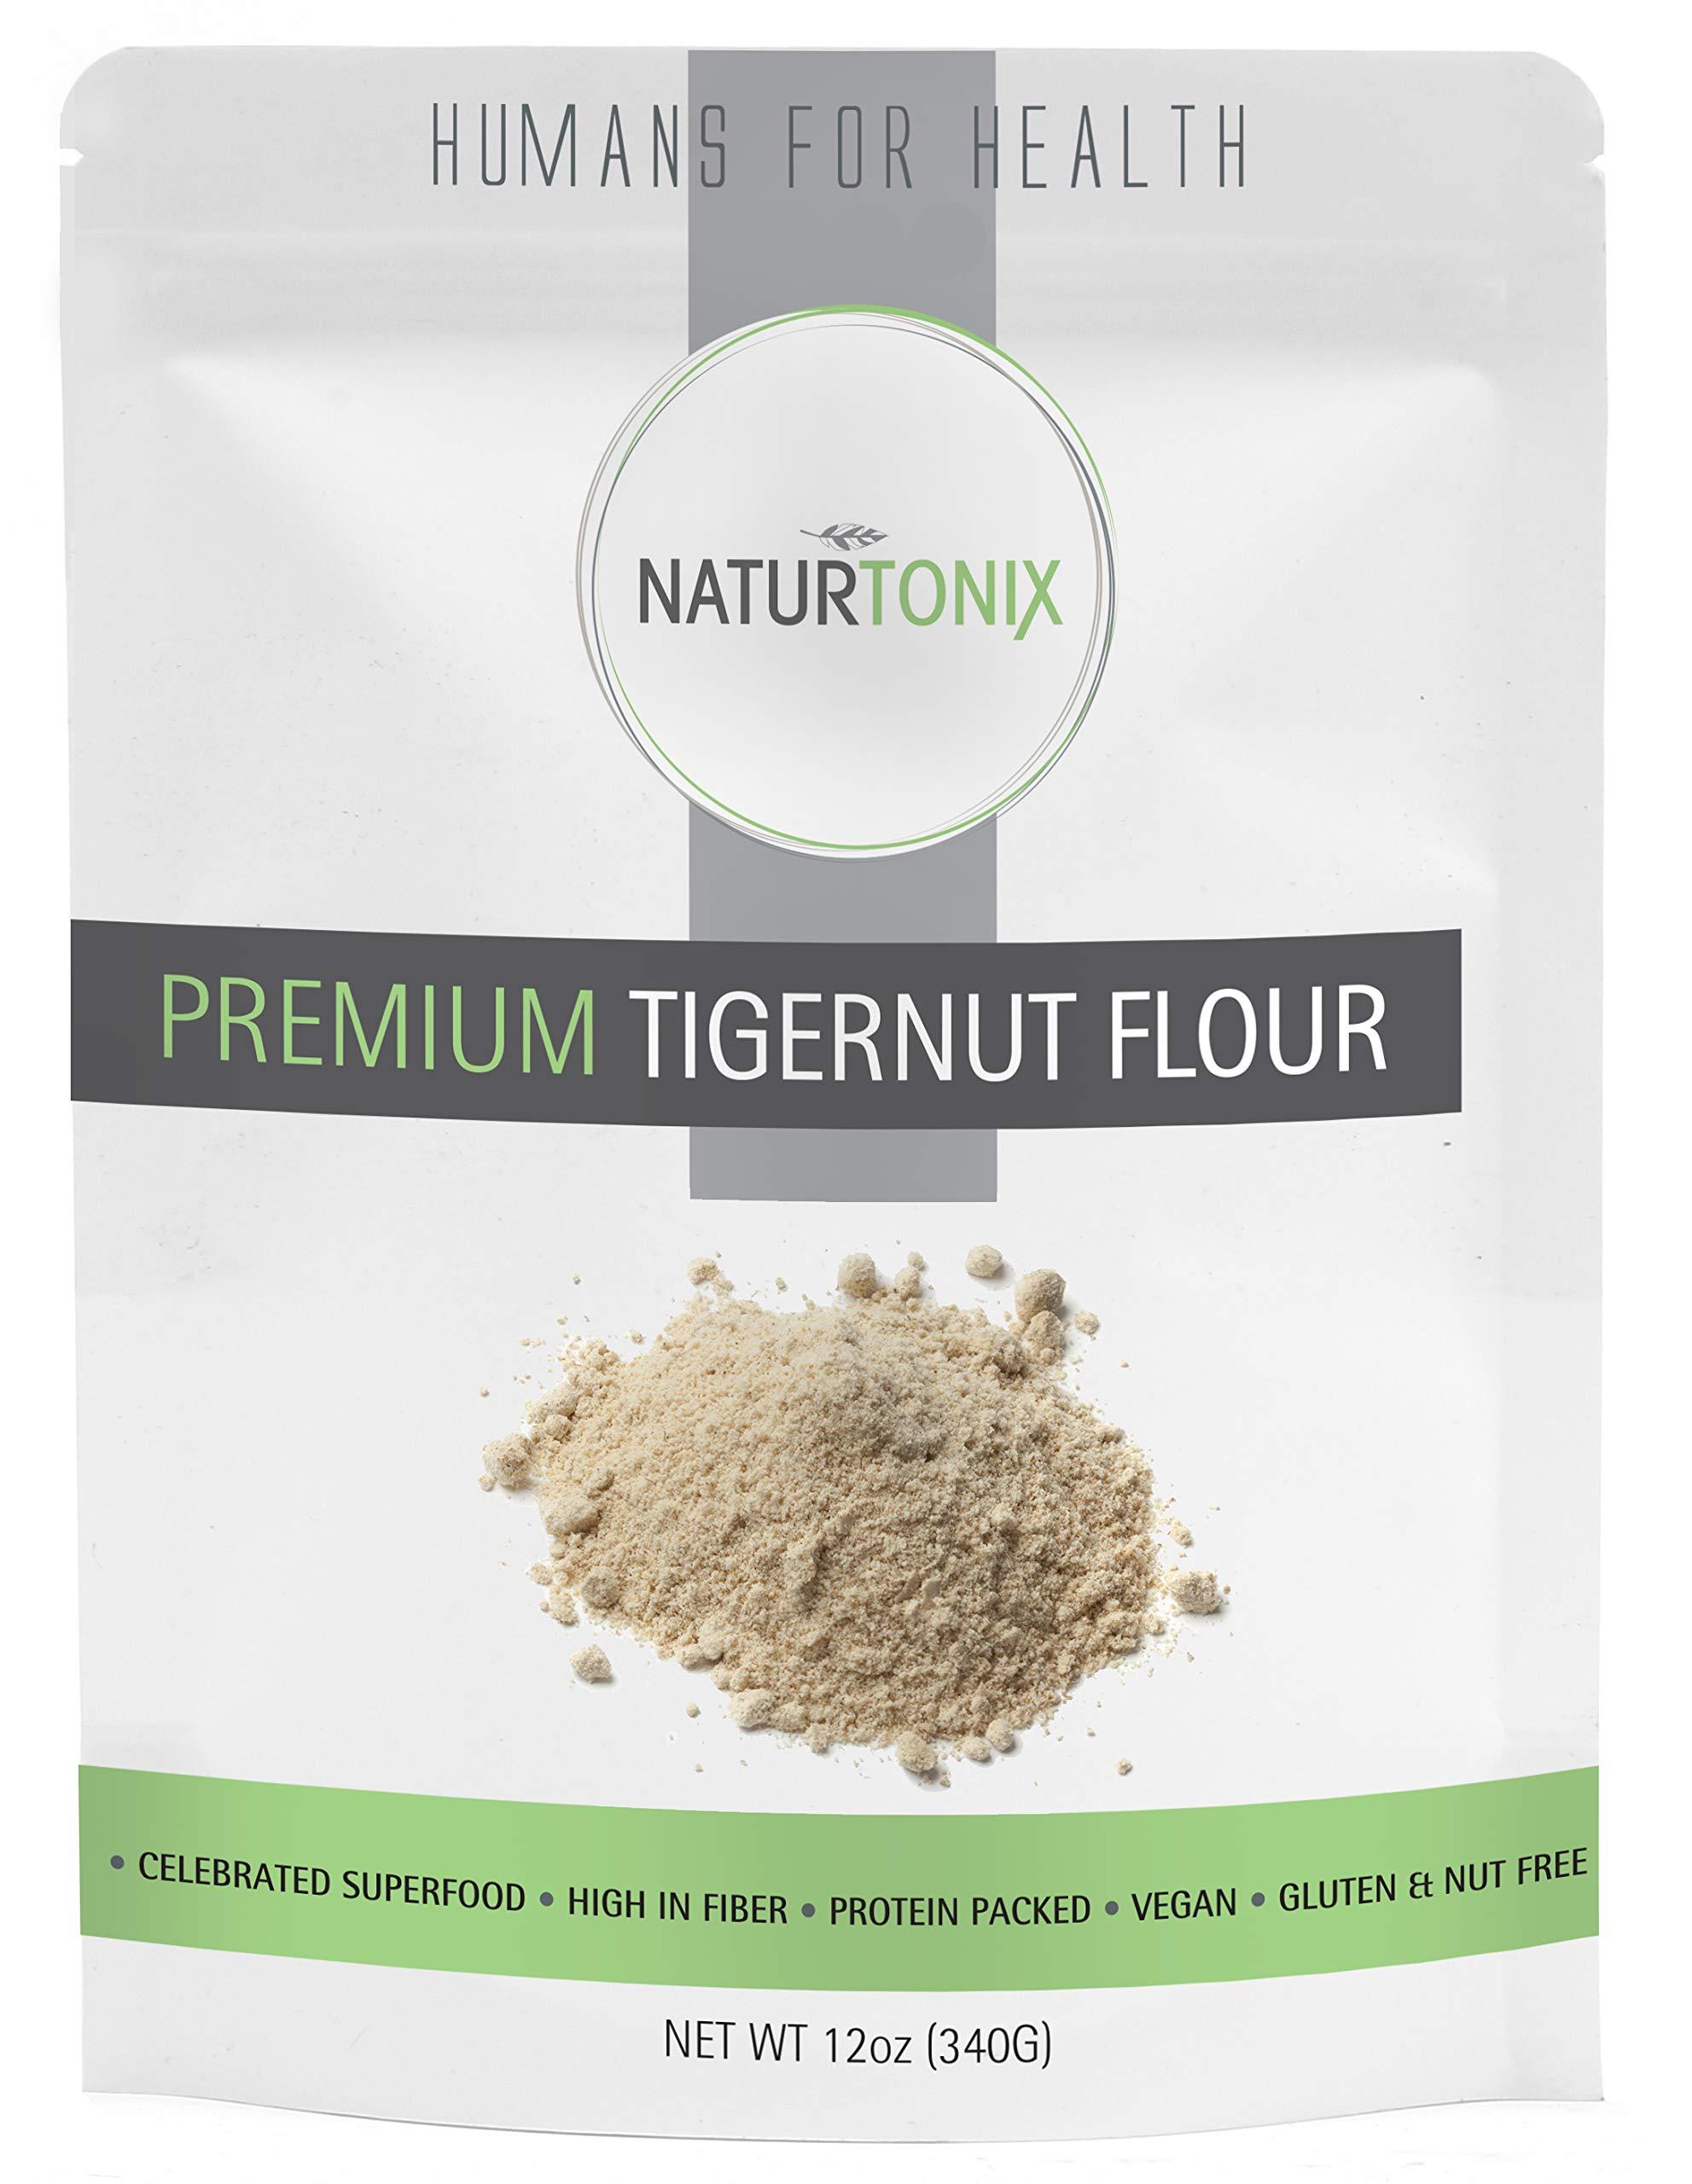 Premium Tiger Nut Flour, 12 oz Resealable Fresh Pouch, Gluten Free, Non GMO, Nut Free, Paleo and Keto Diet Friendly, Certified Kosher